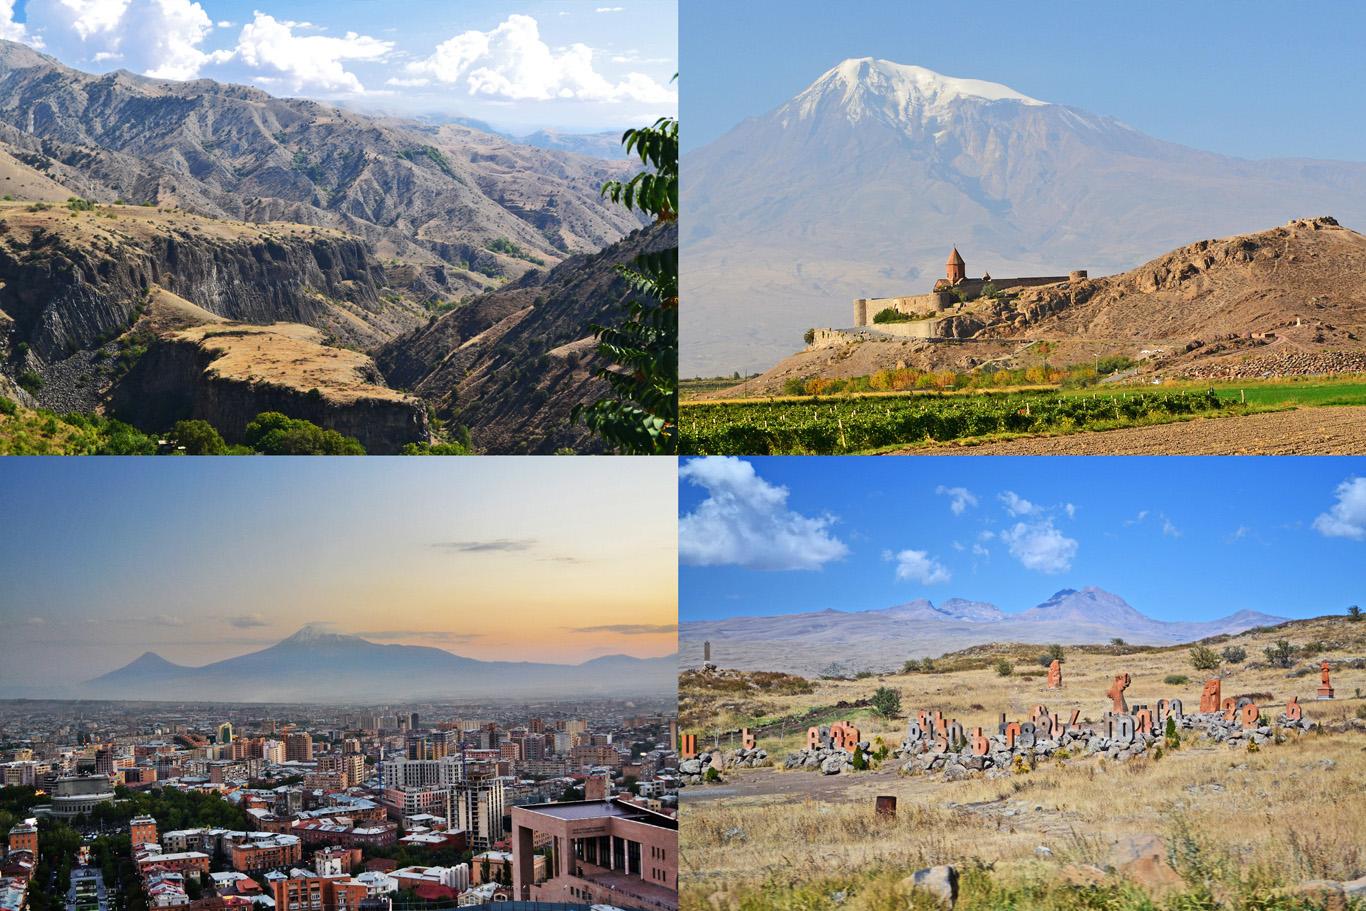 From top left: Canyons at Garni, Khor Virap, Mount Ararat seen from Yerevan, Armenian countryside